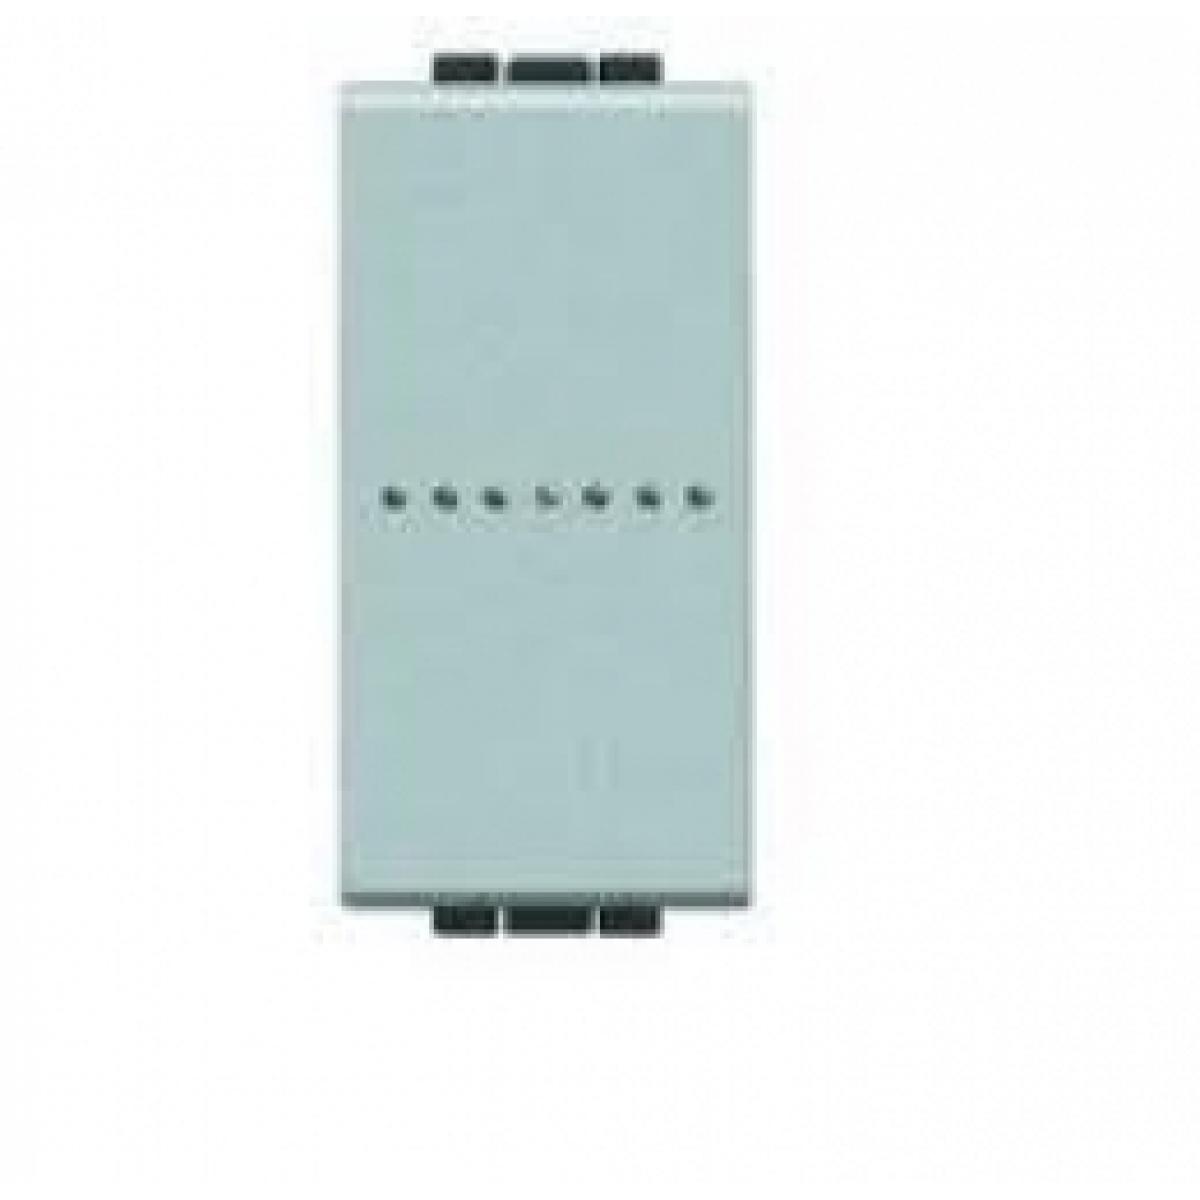 Deviatore bticino light tech 1p 16a 1 modulo NT4053A